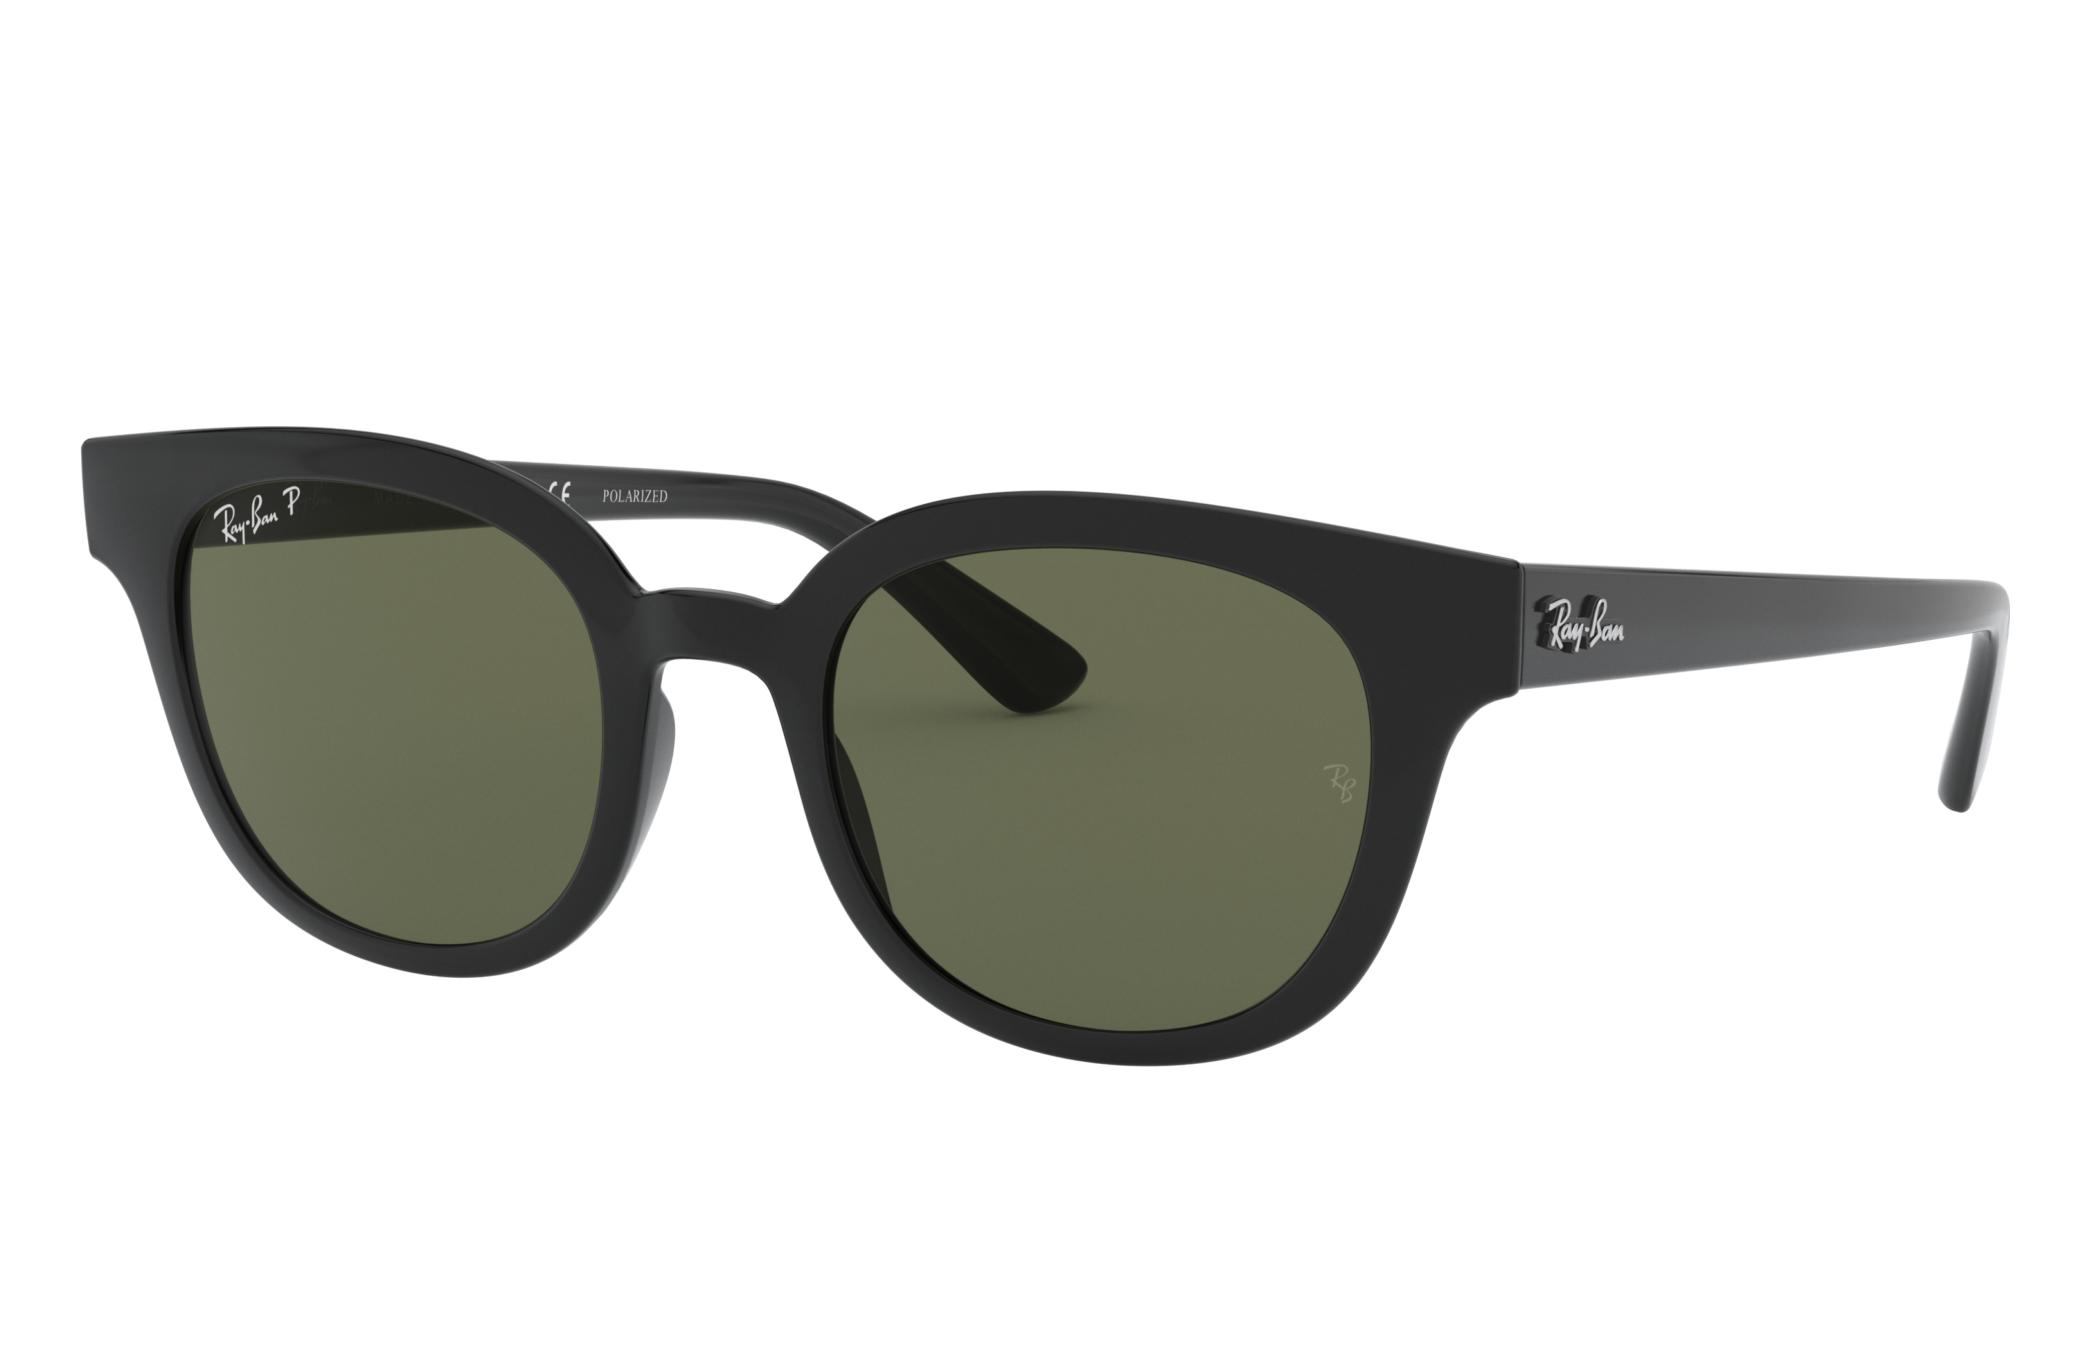 Ray-Ban Rb4324 Low Bridge Fit Black, Polarized Green Lenses - RB4324F